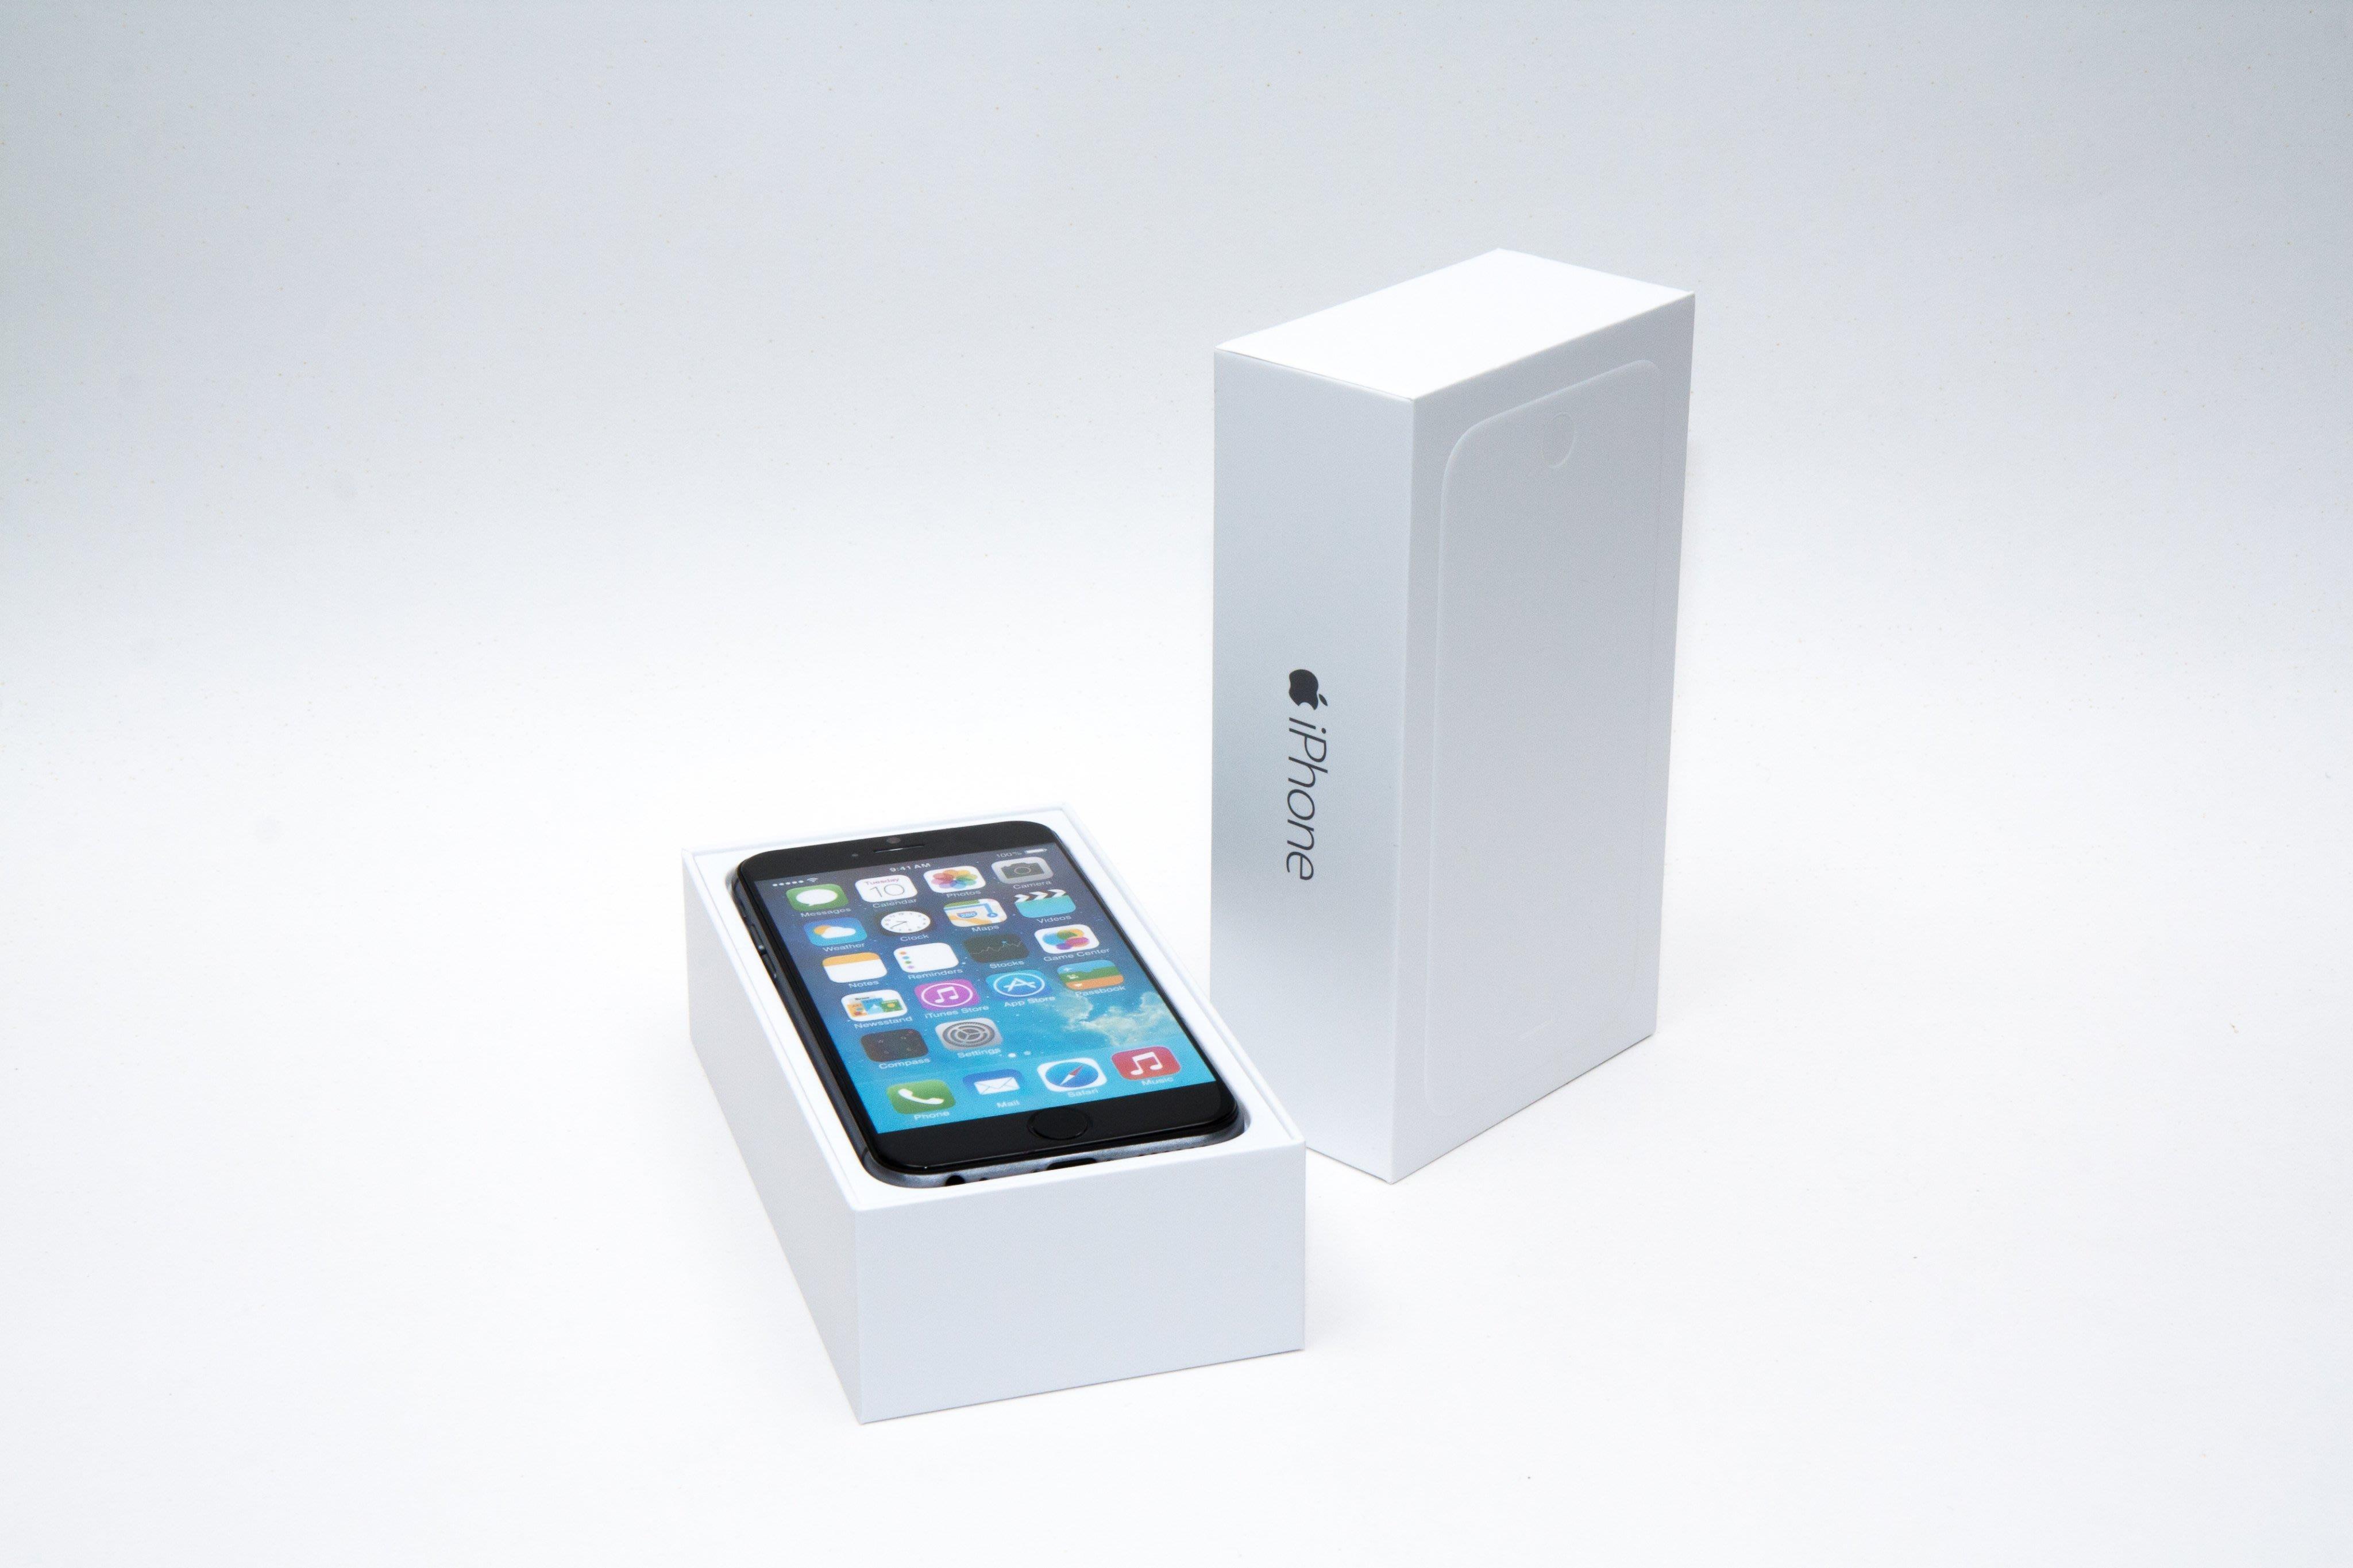 【GooMea】實拍 原廠 外包裝盒Apple蘋果iPhone 6 6 Plus 4.7吋 5.5吋 外盒 外箱 白盒